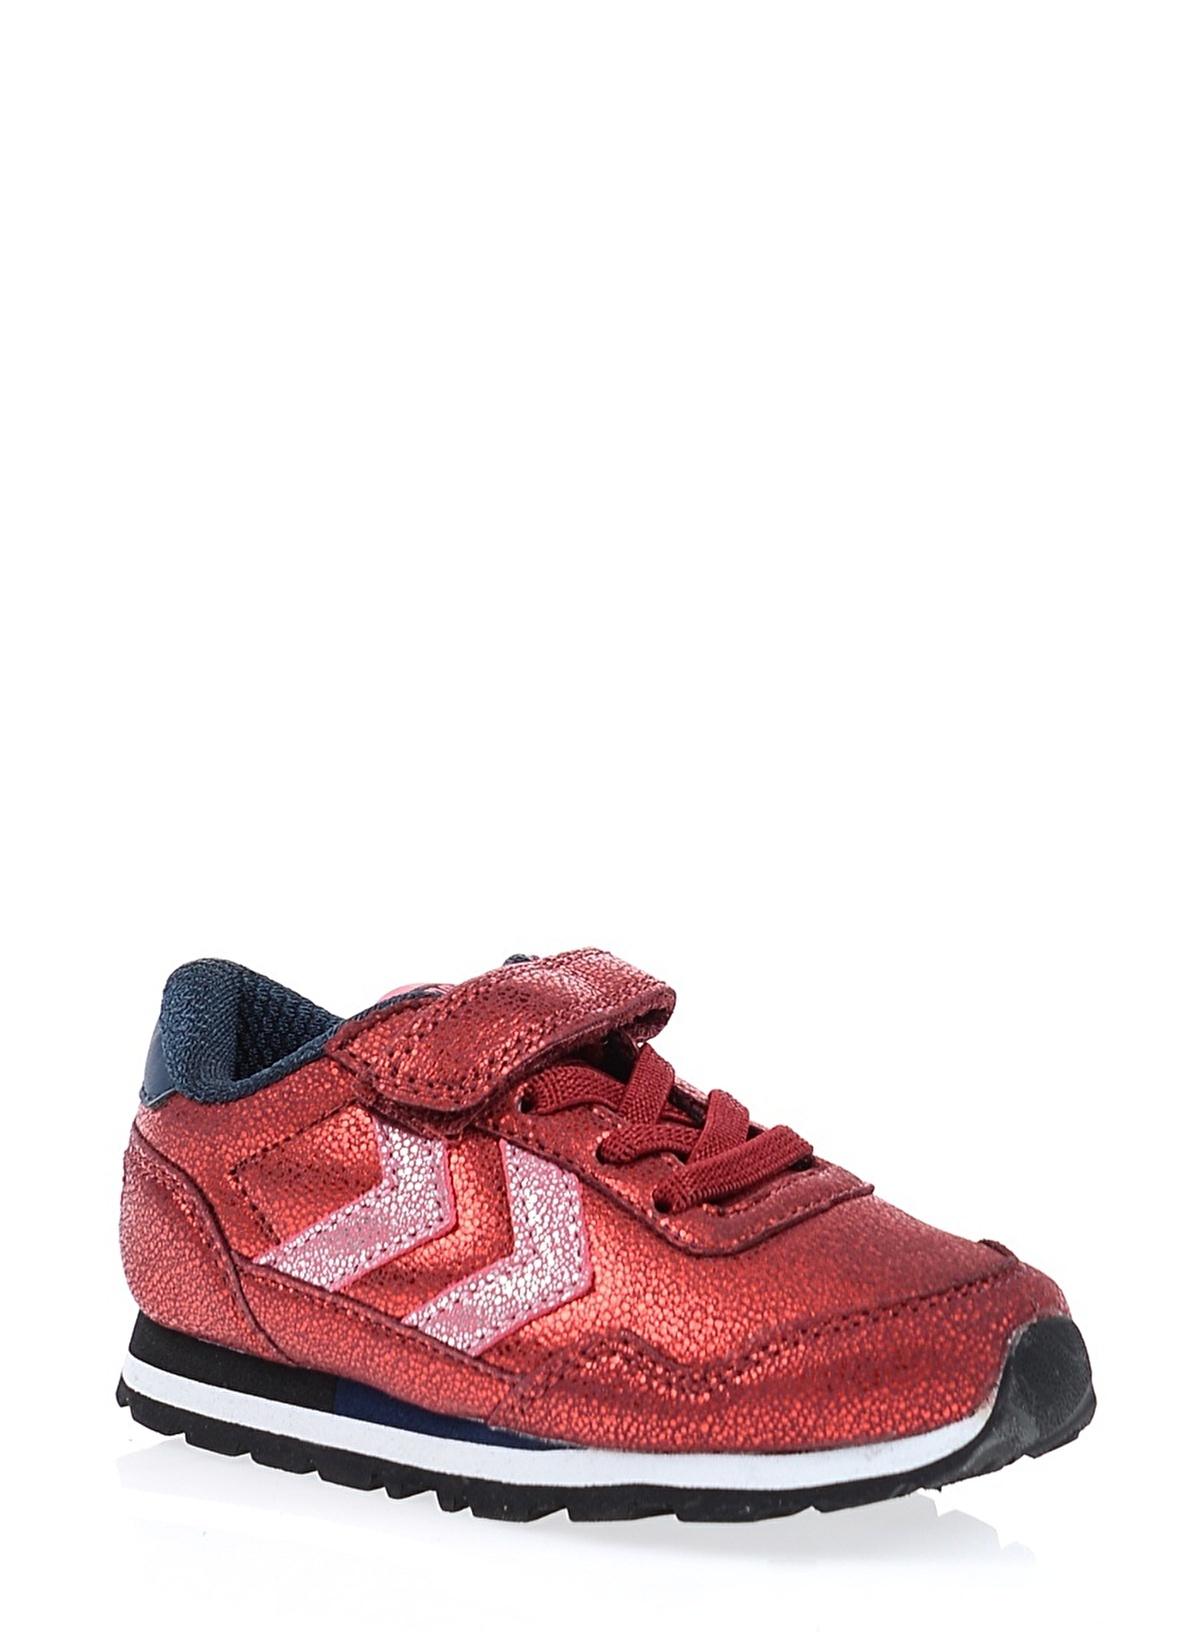 Hummel Spor Ayakkabı 64235-3506 Hummel Reflex Prıncess Jr Lo – 109.95 TL